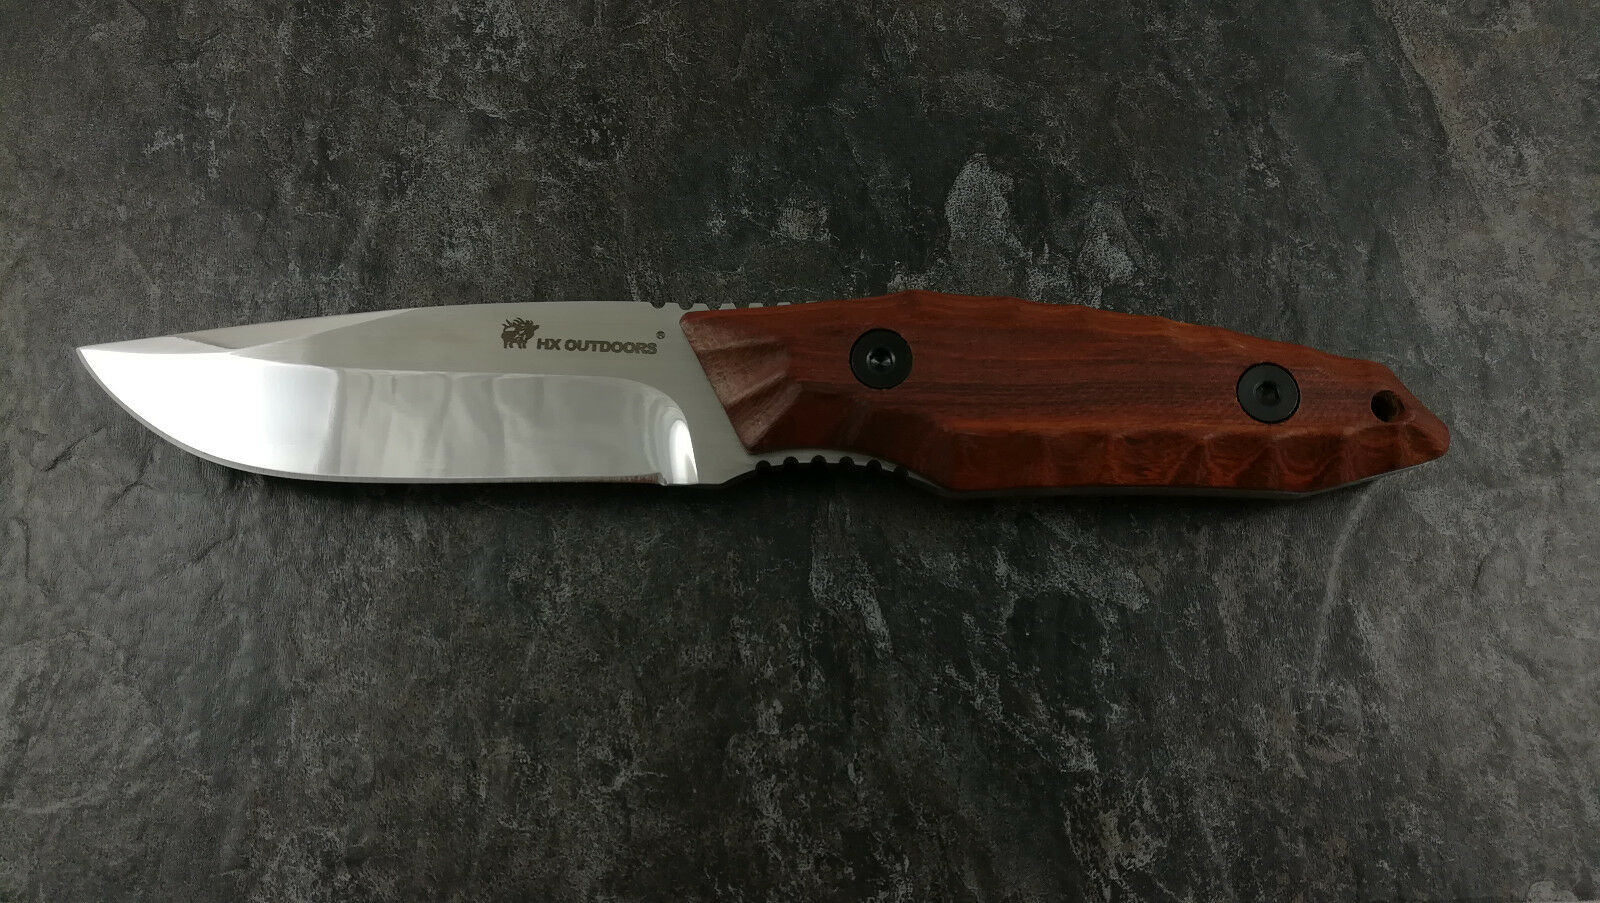 HX OUTDOORS D 145 Survival Bushcraft Outdoor Messer Messer Messer Holz Echt Leder Jagdmesser    Hervorragende Eigenschaften  fe1853